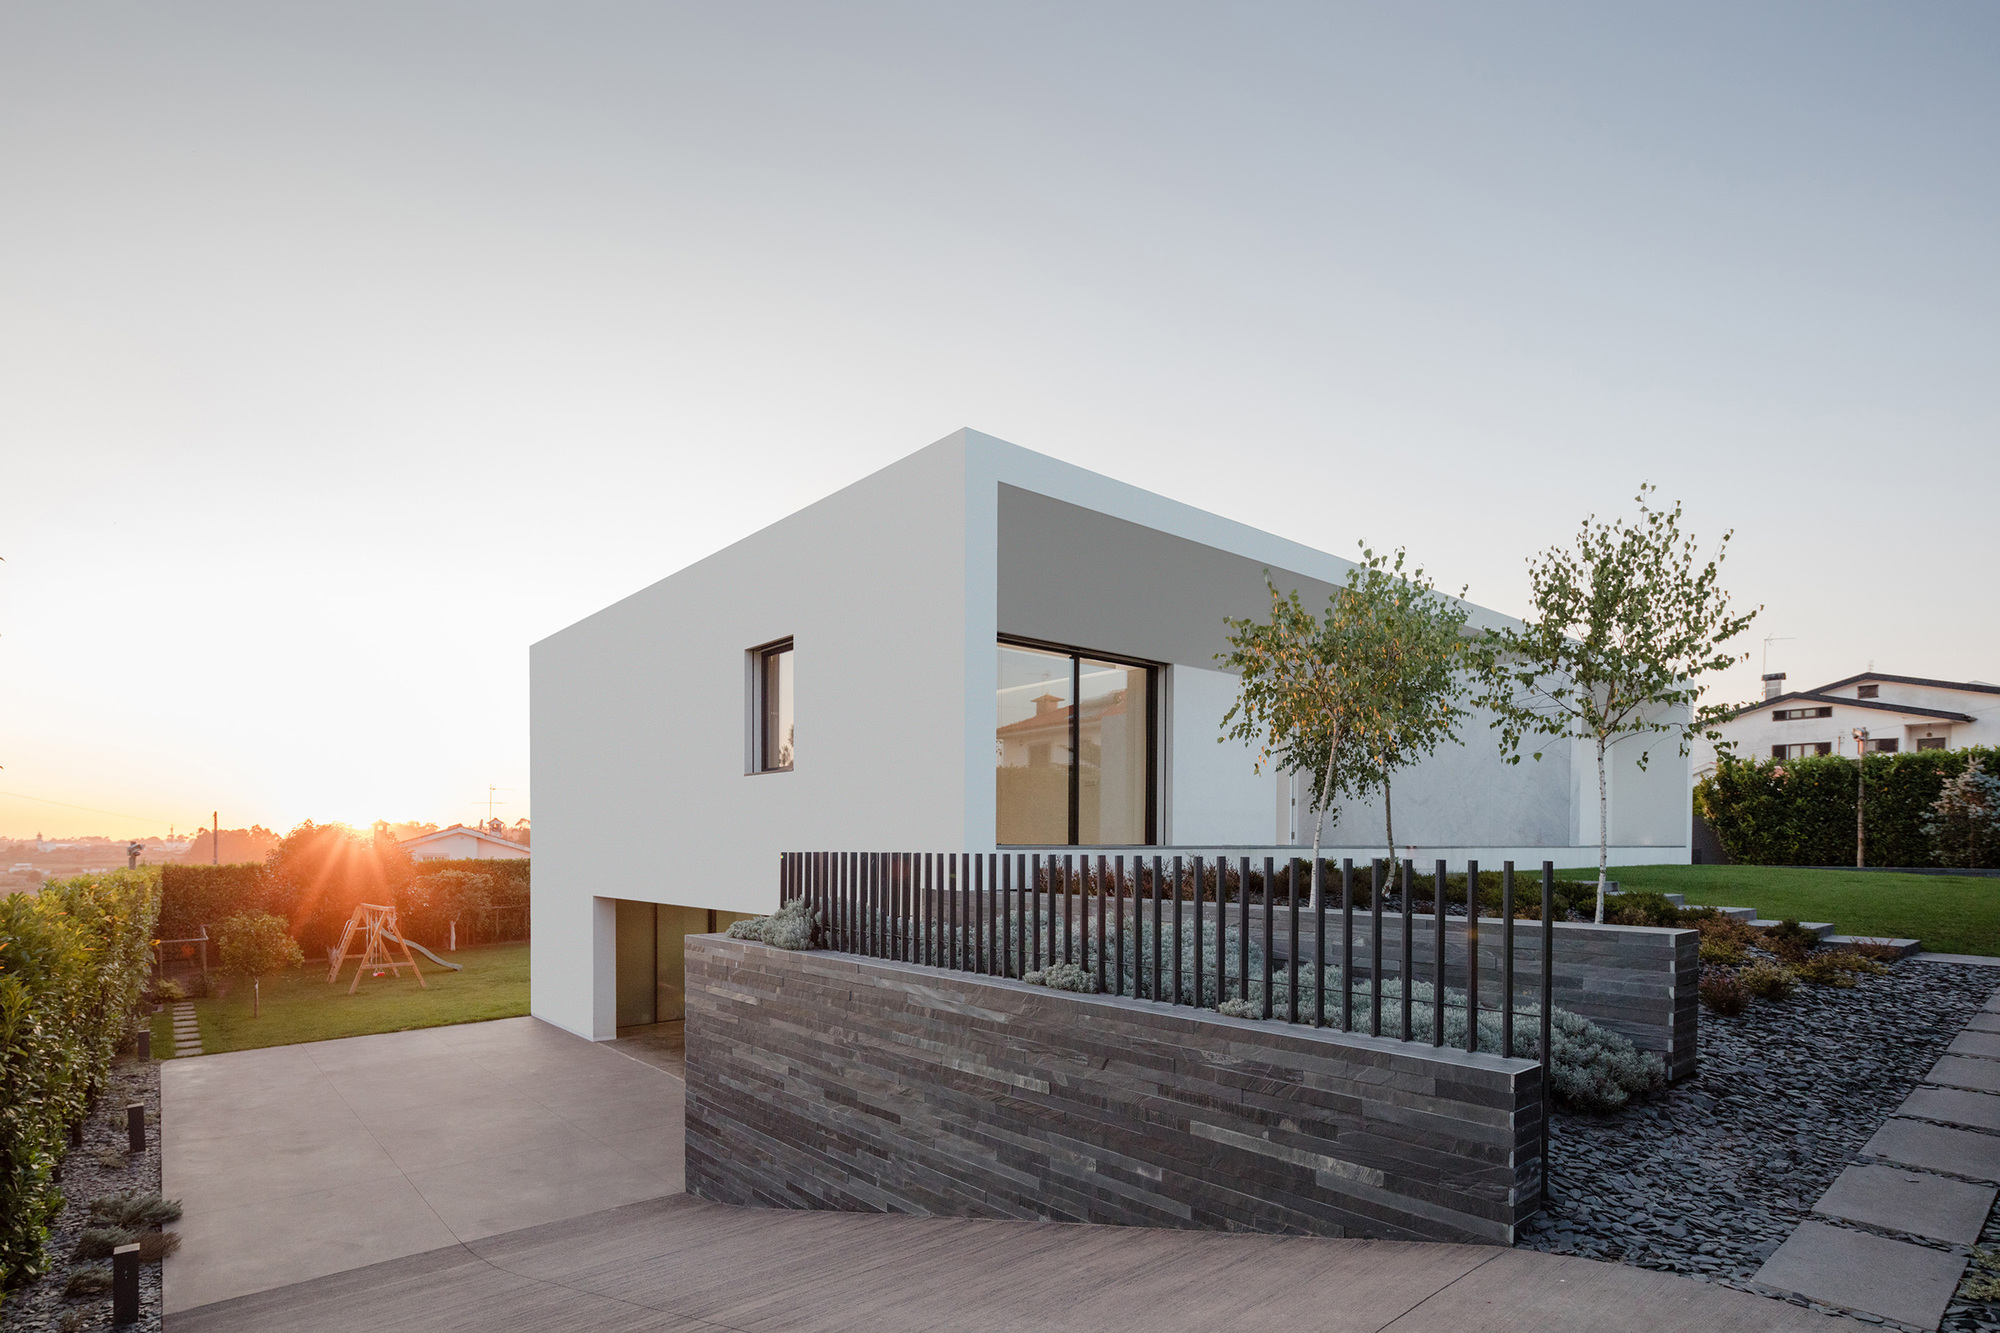 Galeria de casa vila do conde raulino silva arquitecto 2 for Arquitectos para casas